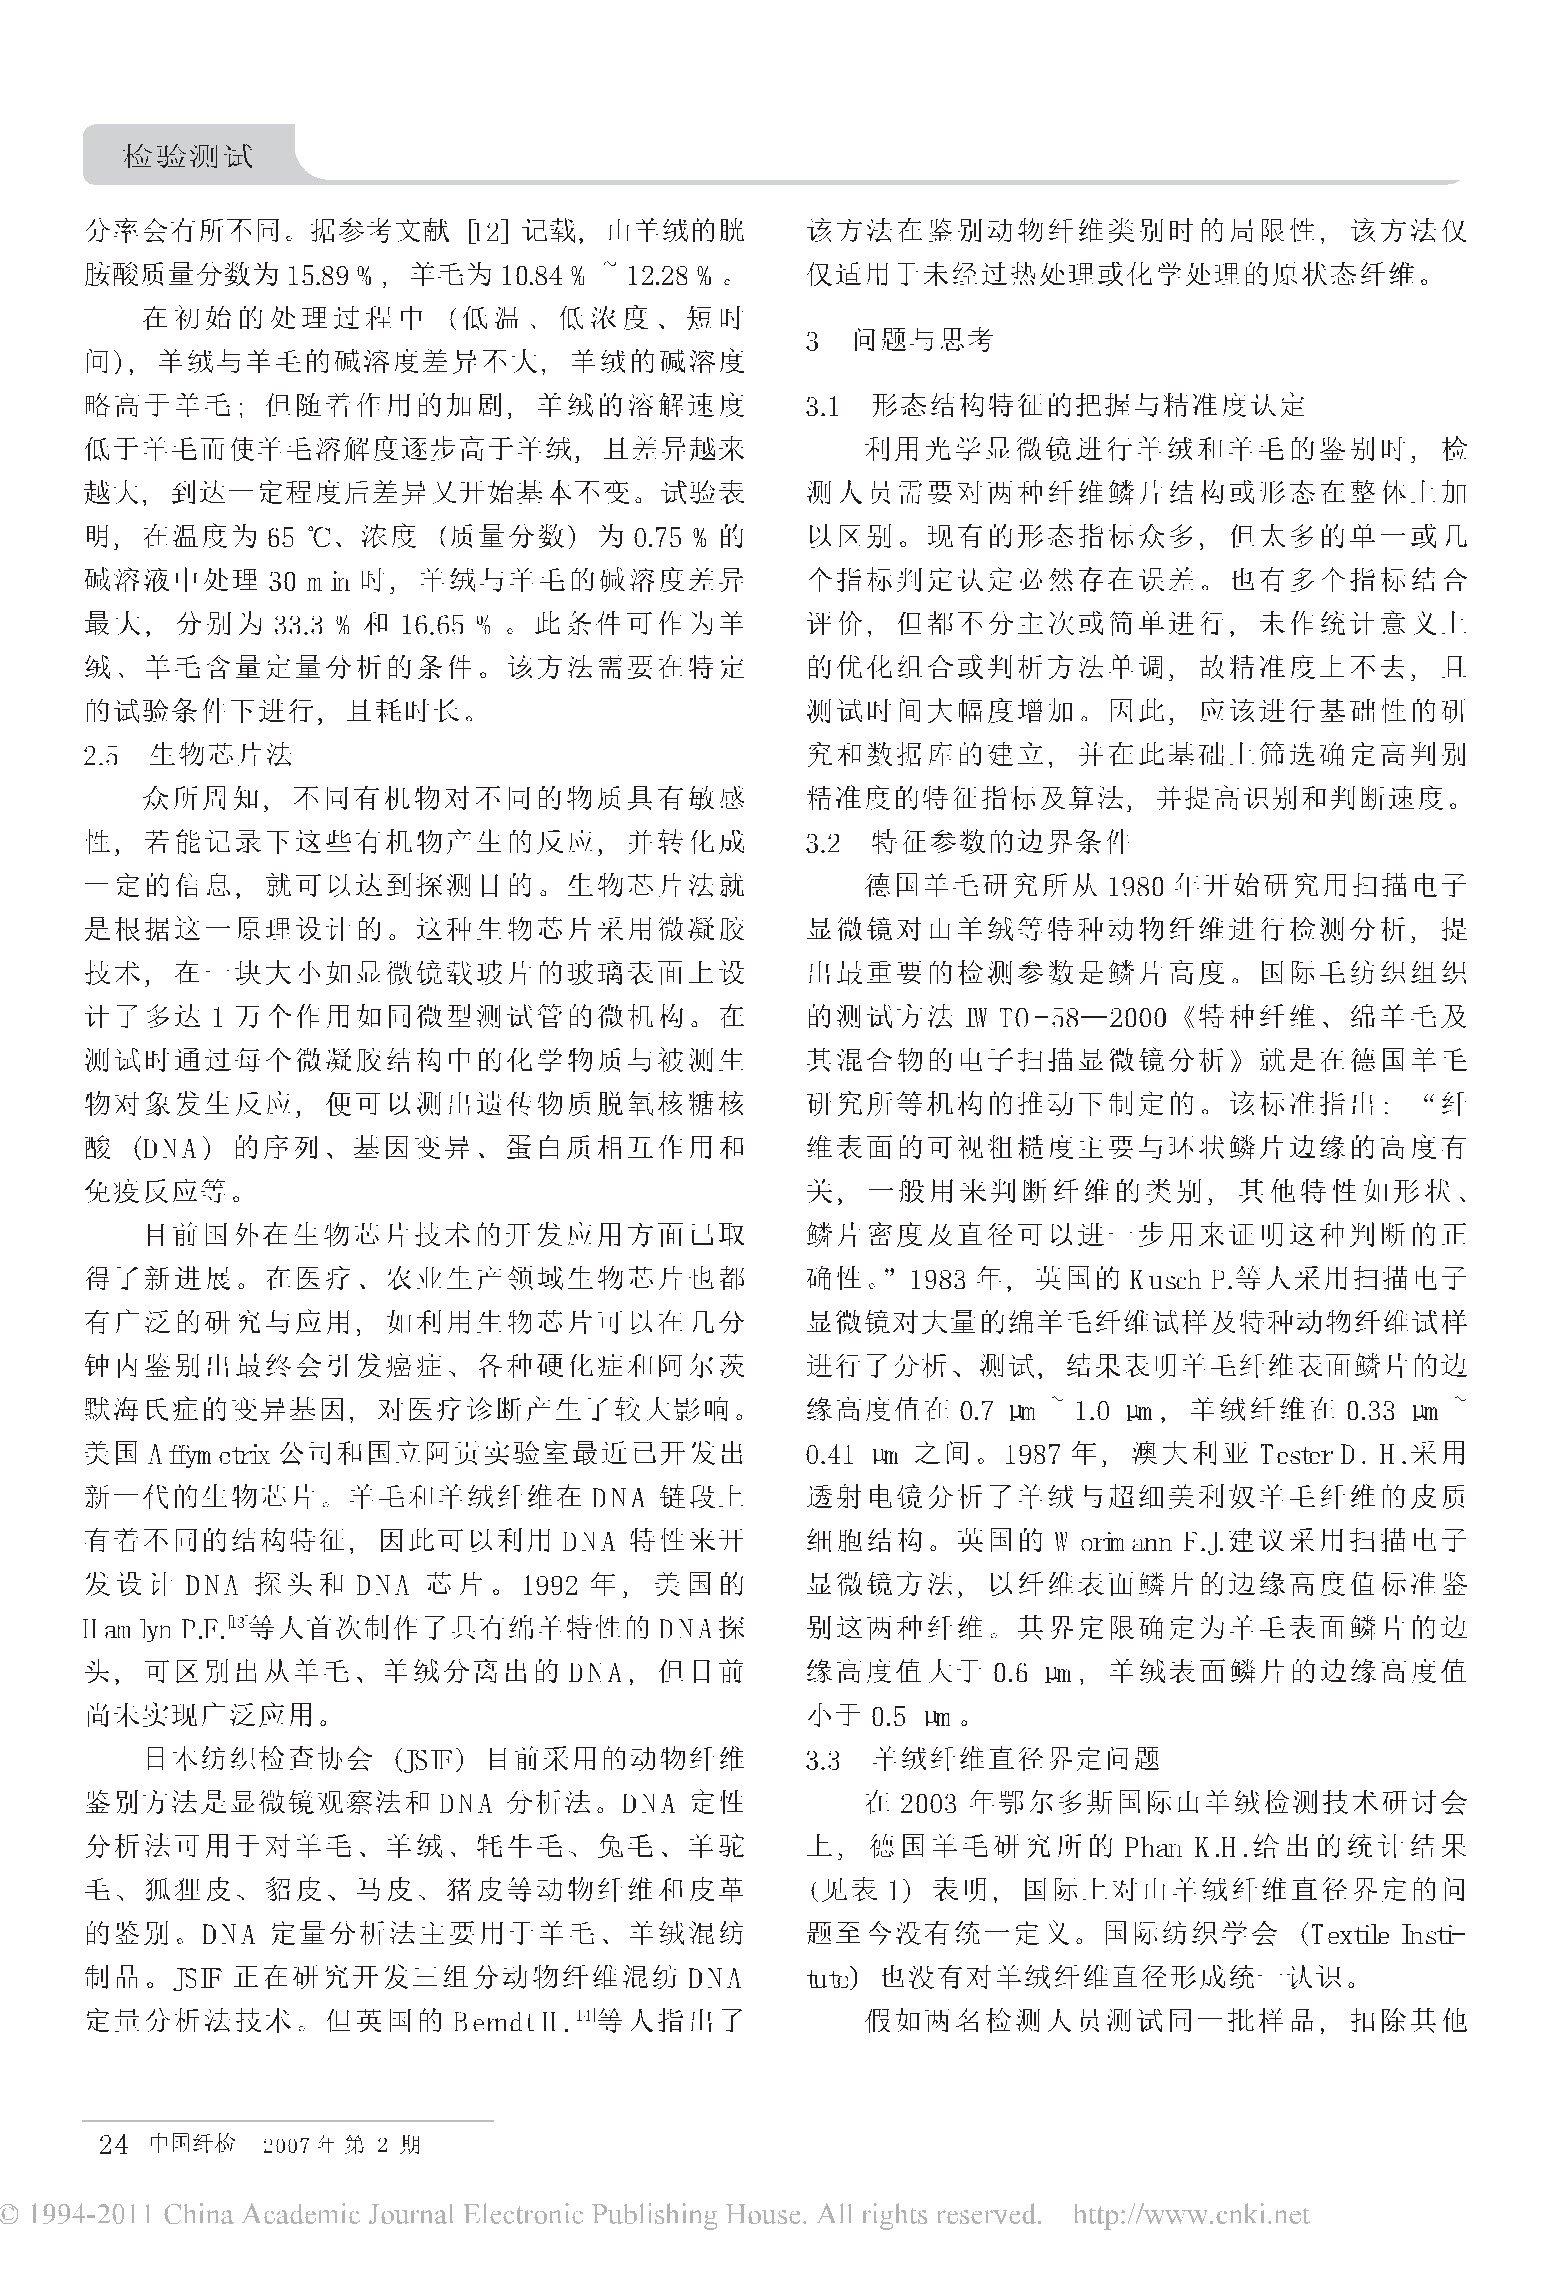 Copy of 13.jpg